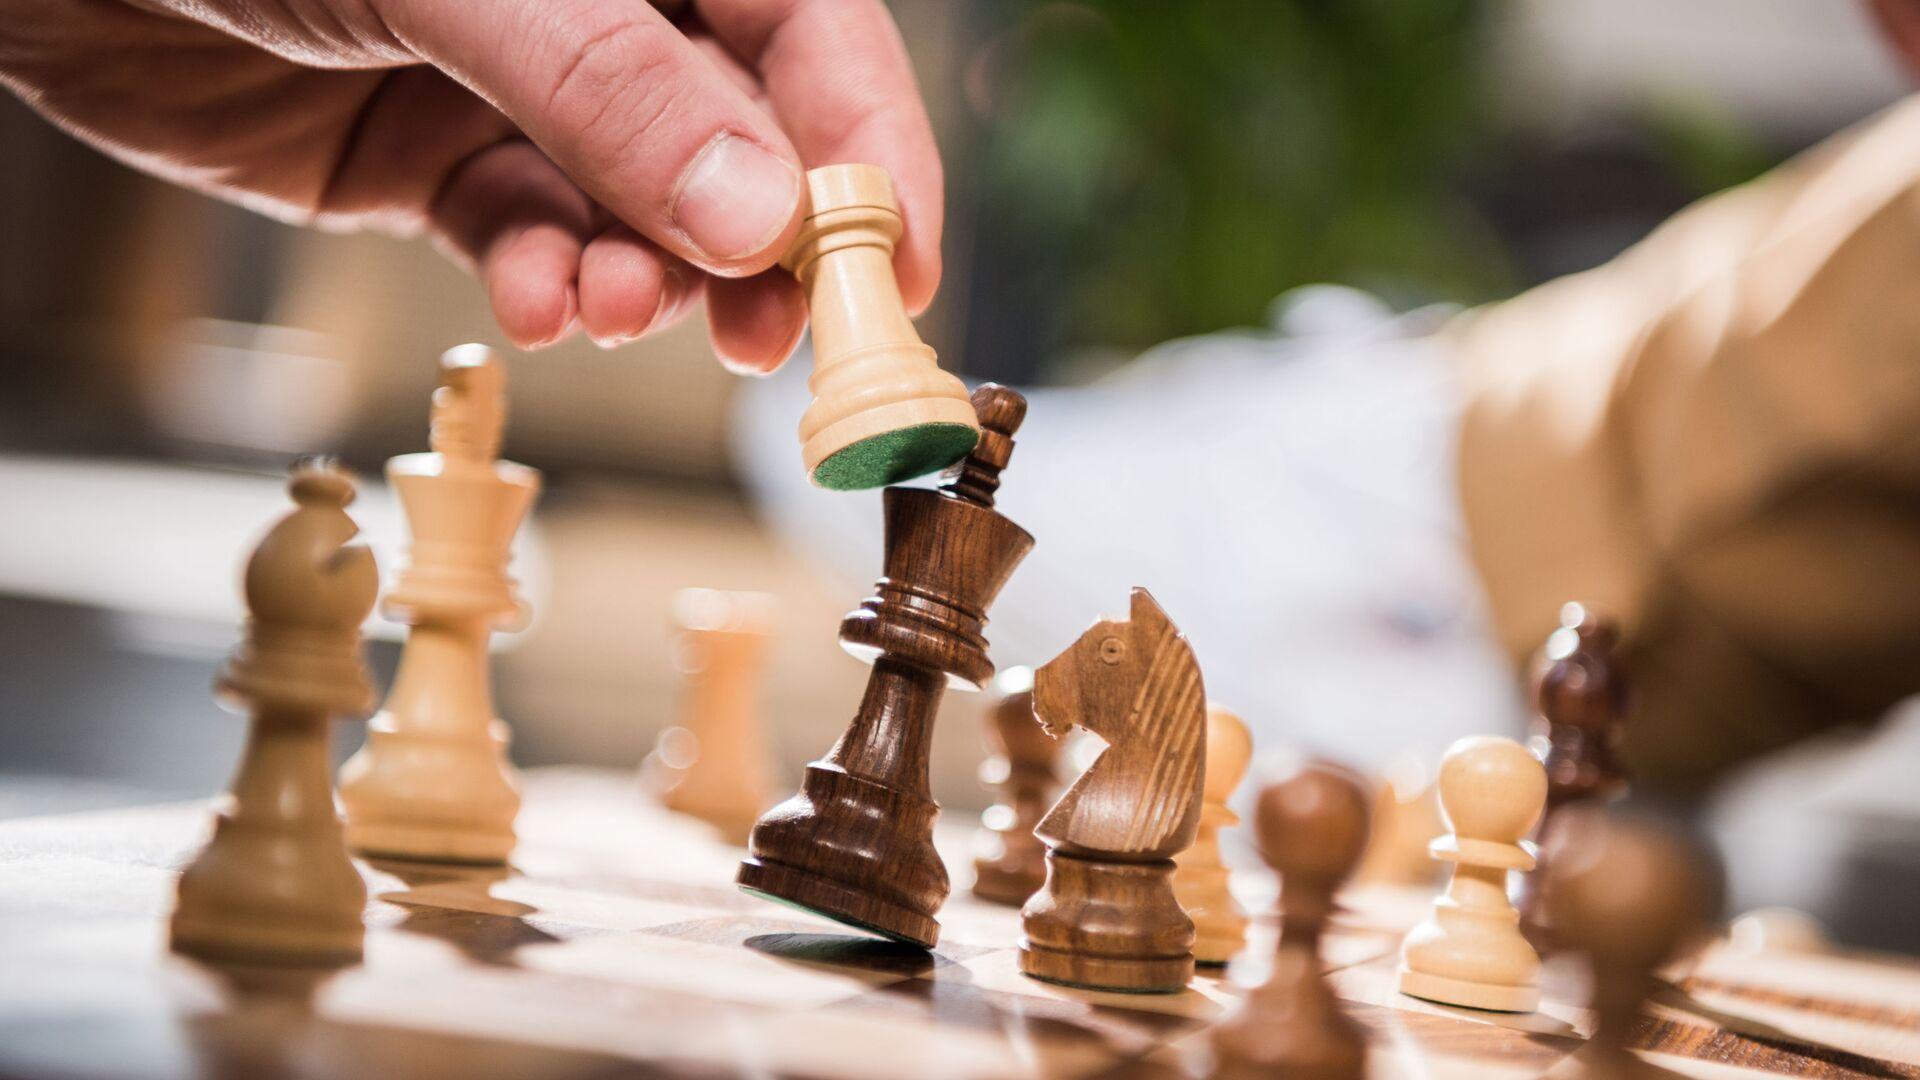 Игра в шахматы - Sputnik Азербайджан, 1920, 30.03.2021